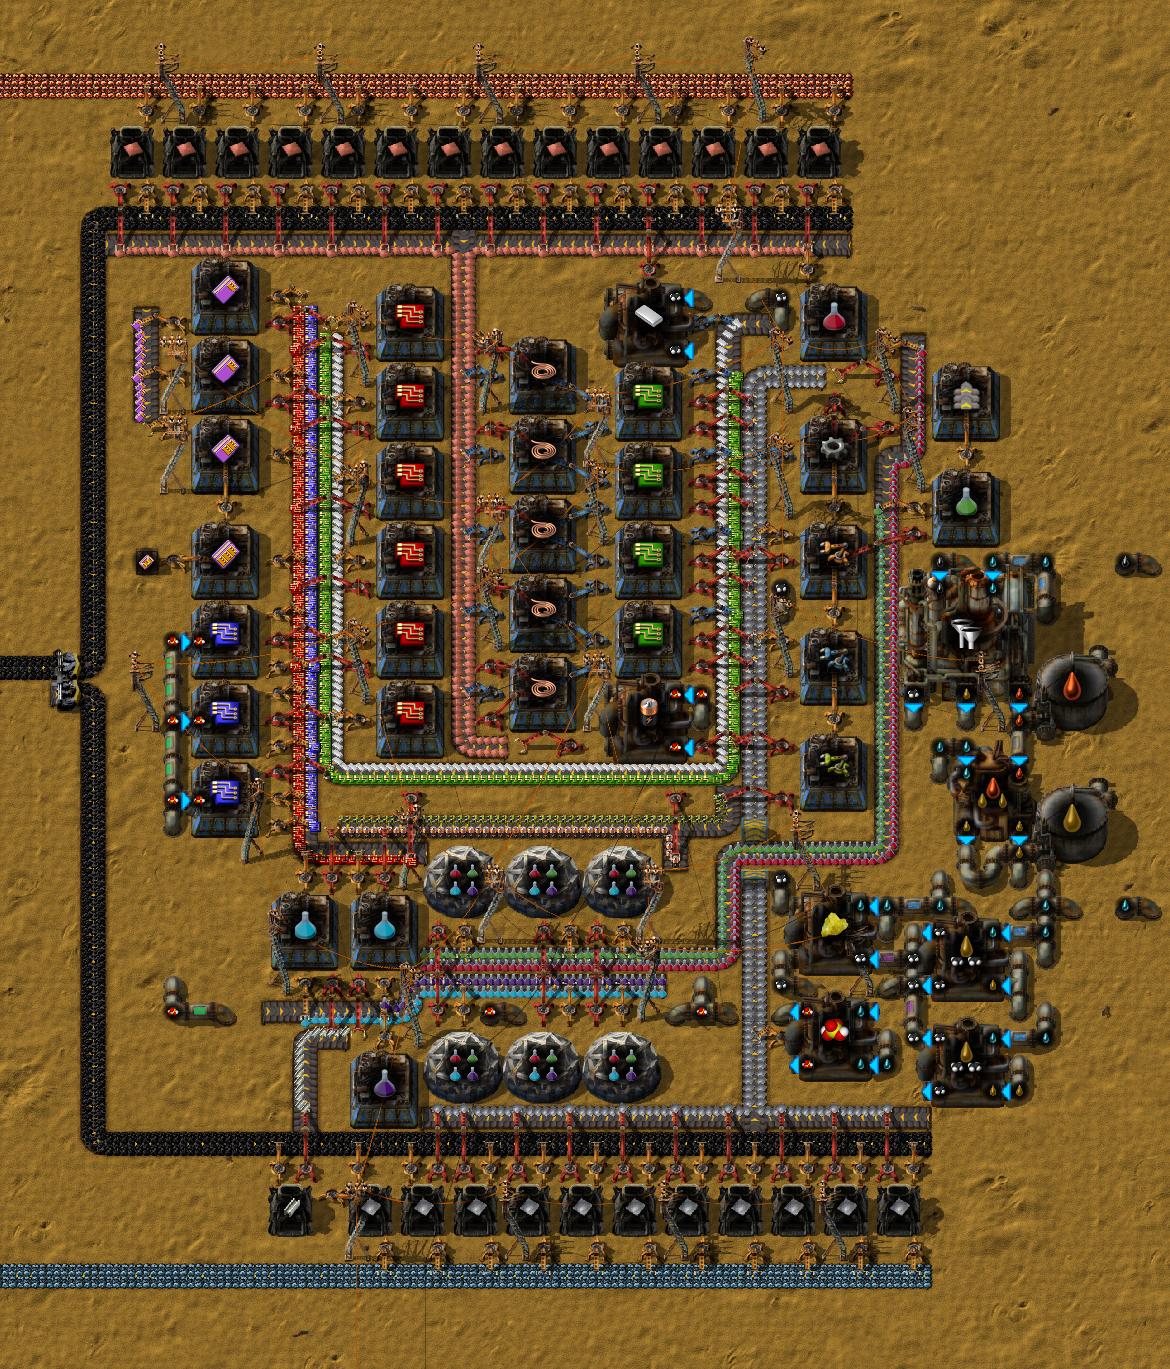 factorio assembling machine inserter